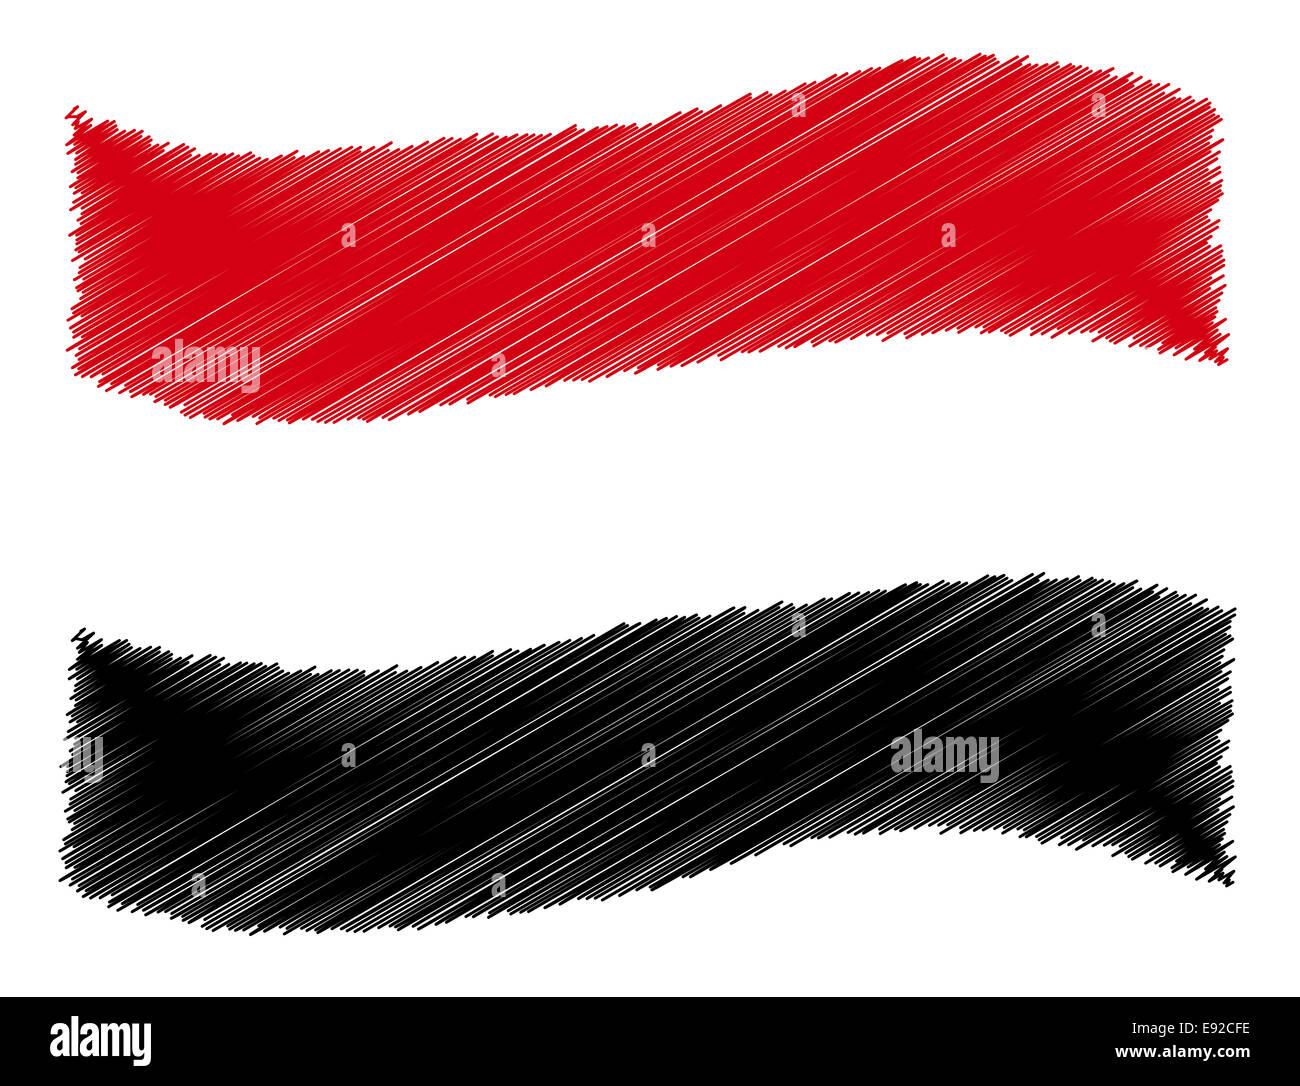 Sketch - Yemen - Stock Image